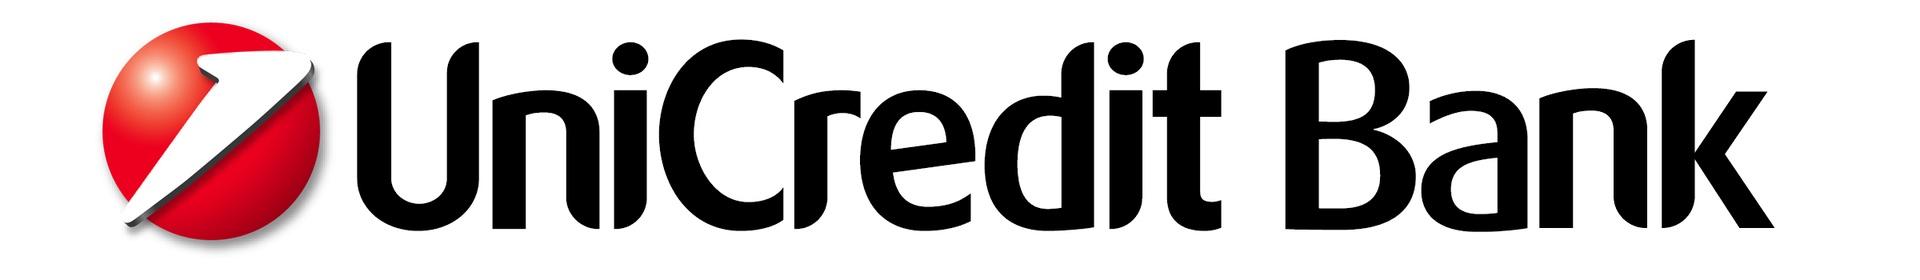 Unicredit_bank_logo